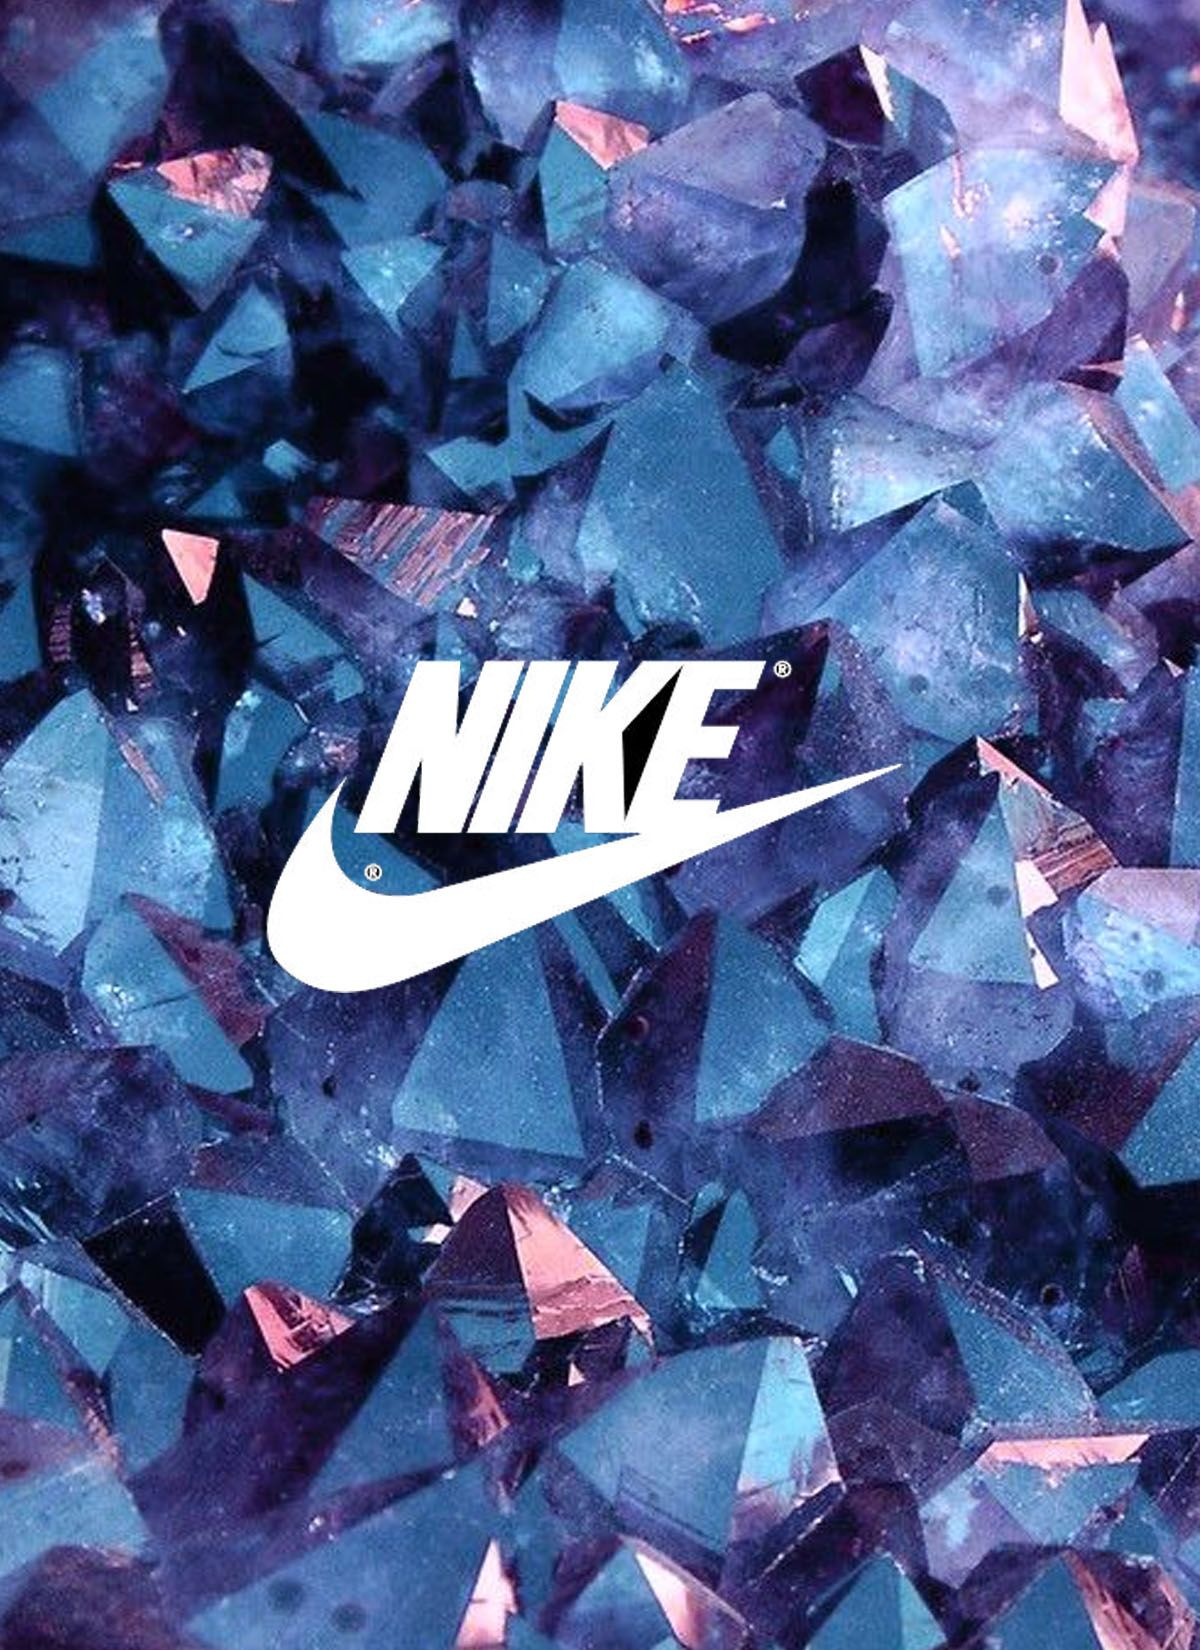 Nike Logo Edit Fond D Ecran Telephone Jolis Papiers Peints Fond Ecran